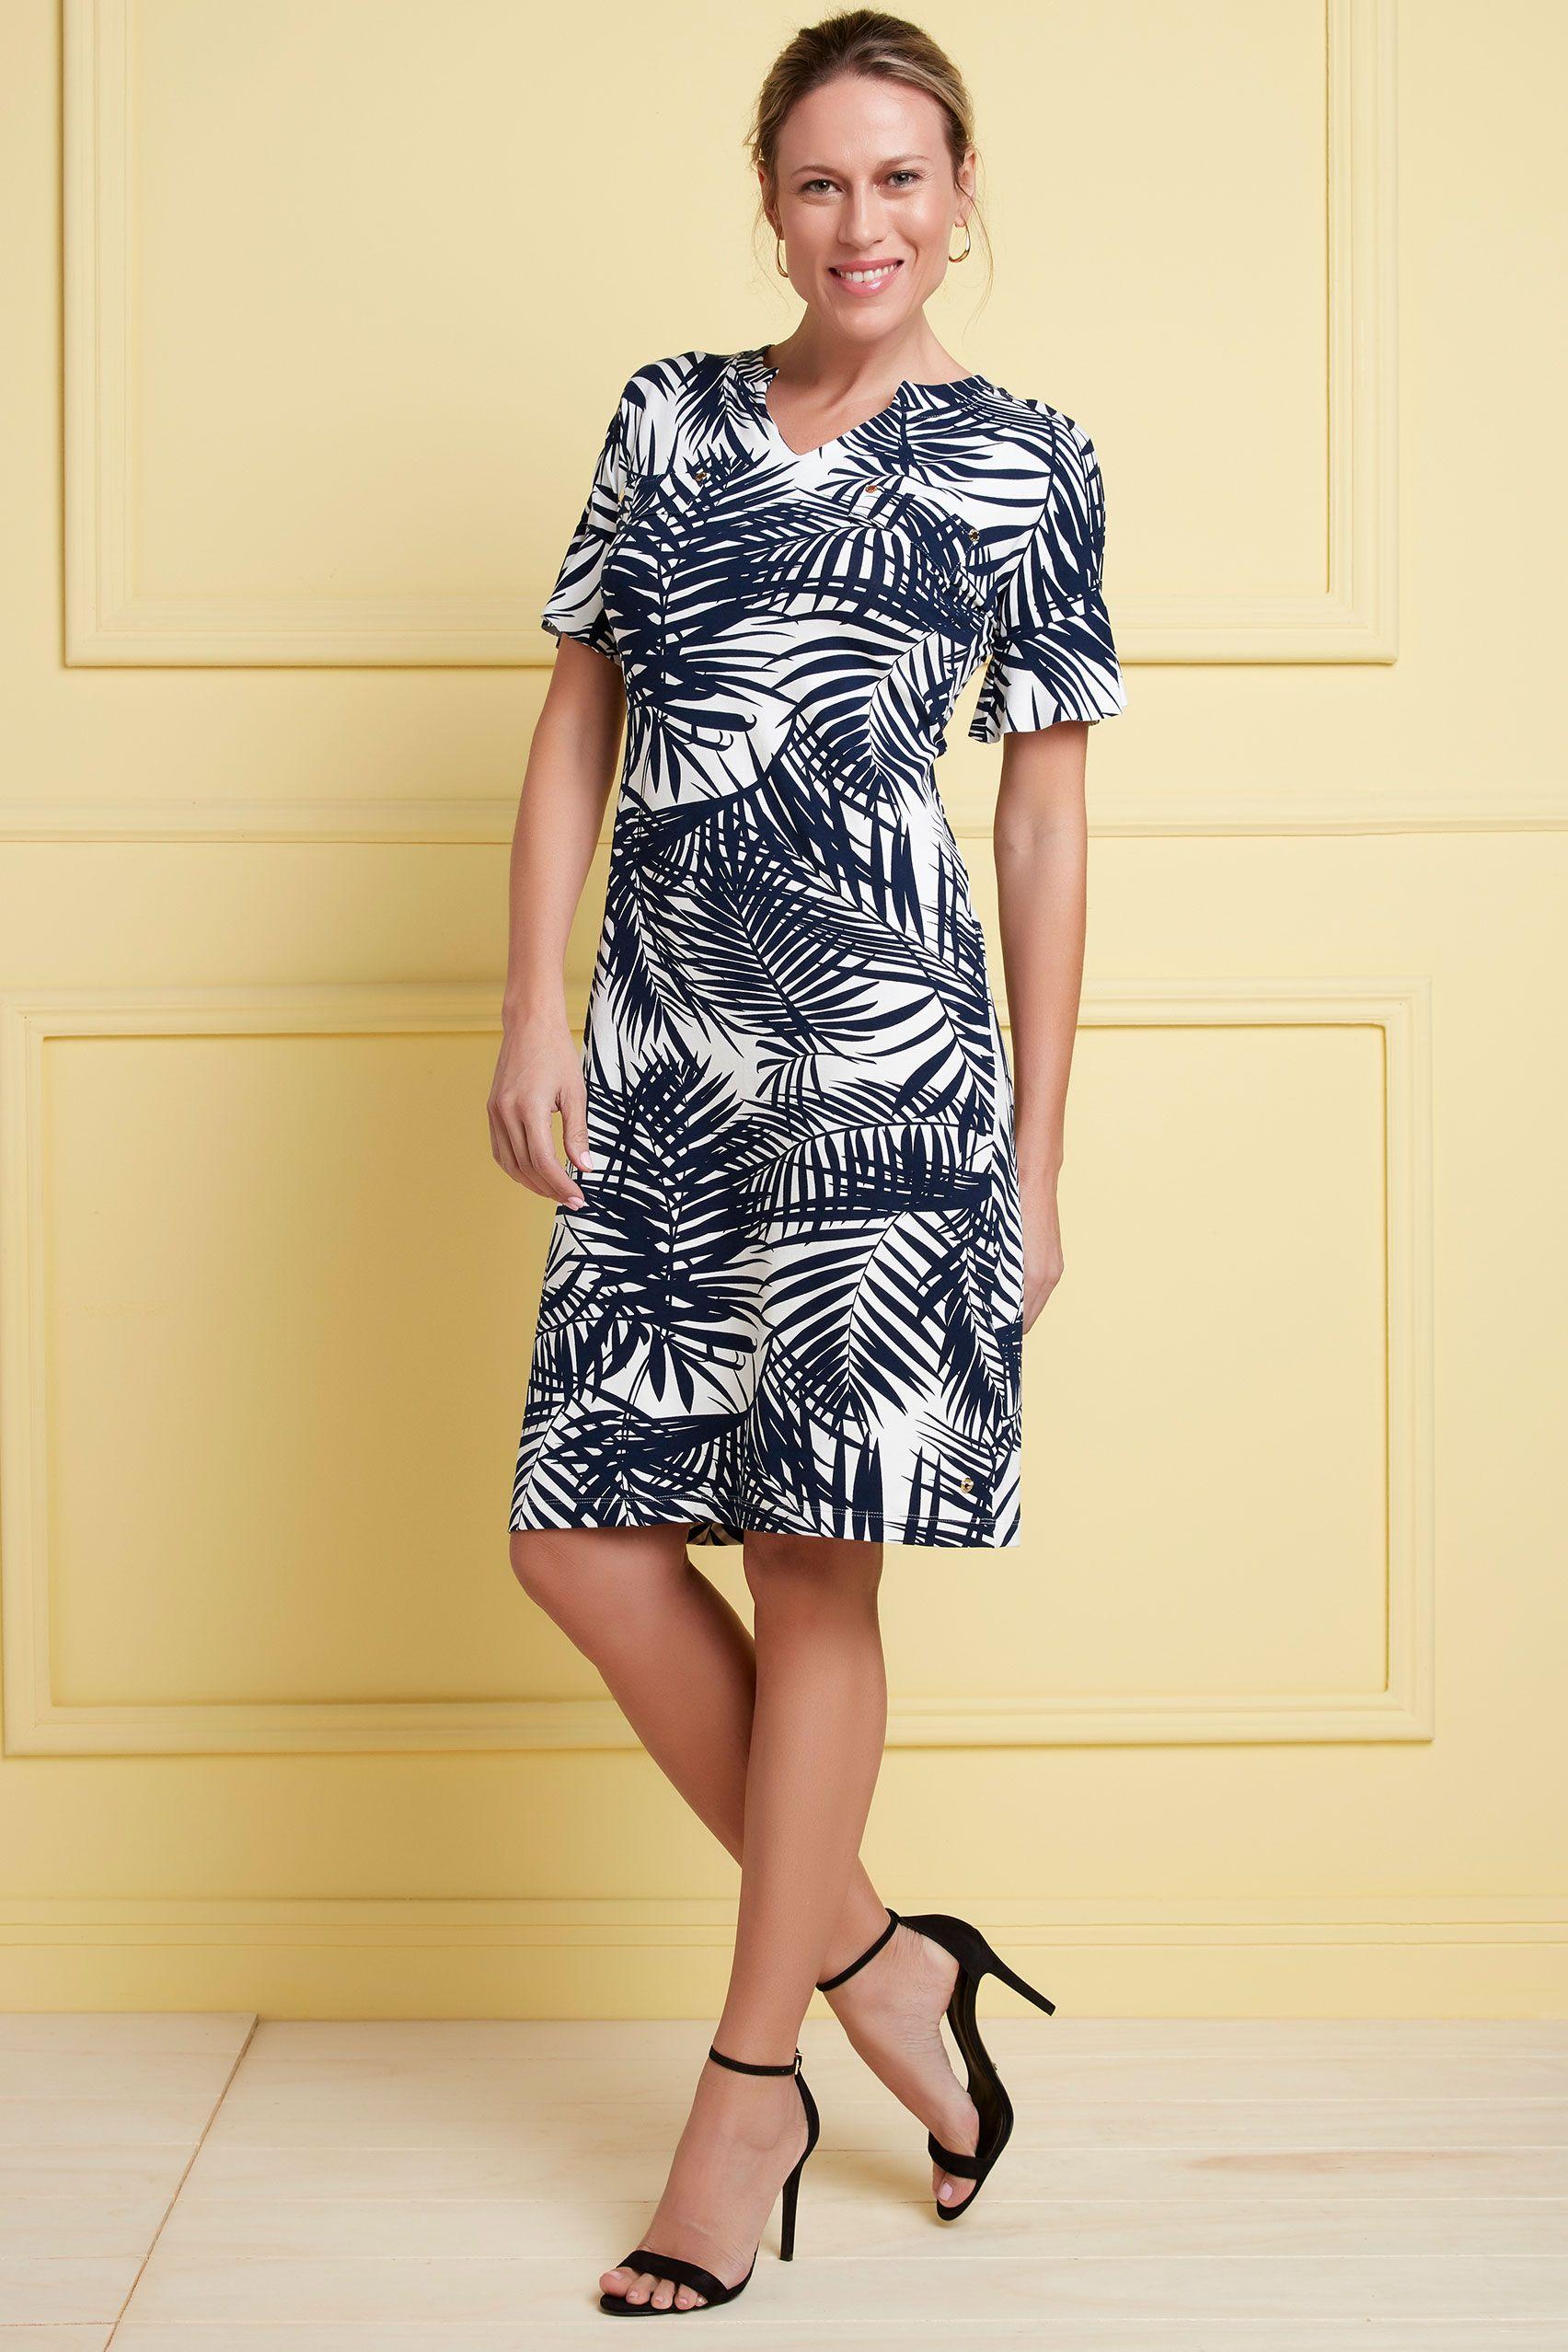 724d23569bec Vestido Isadora Panamá - Stroke - lojastroke | Moda em 2019 ...